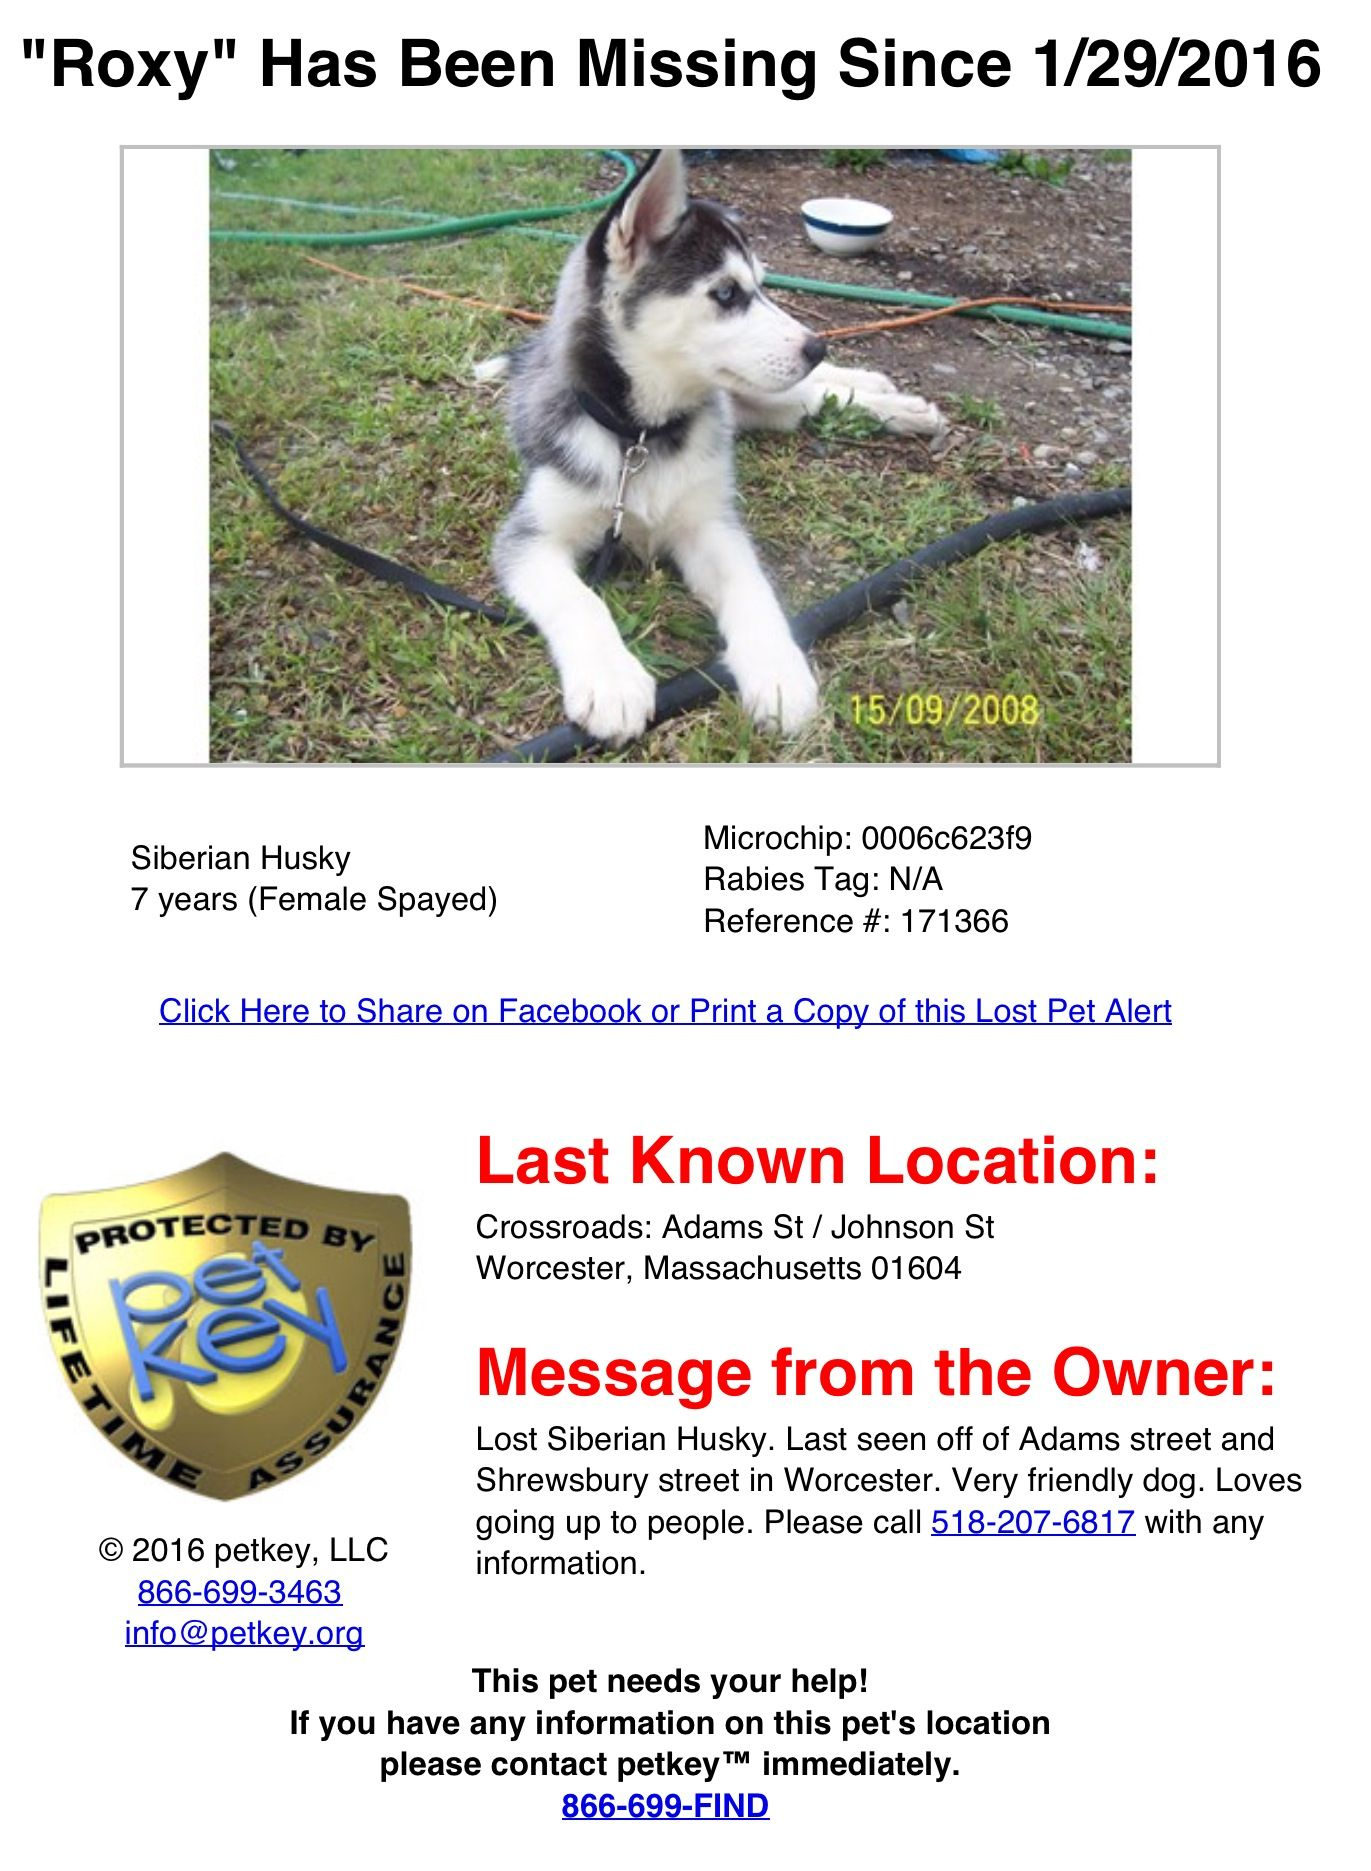 Lost Female Siberian Husky Dog Named Roxy Last Seen Off Of Adams Street And Shrewsbury Street Worcest Husky Dog Names Female Siberian Husky Siberian Husky Dog